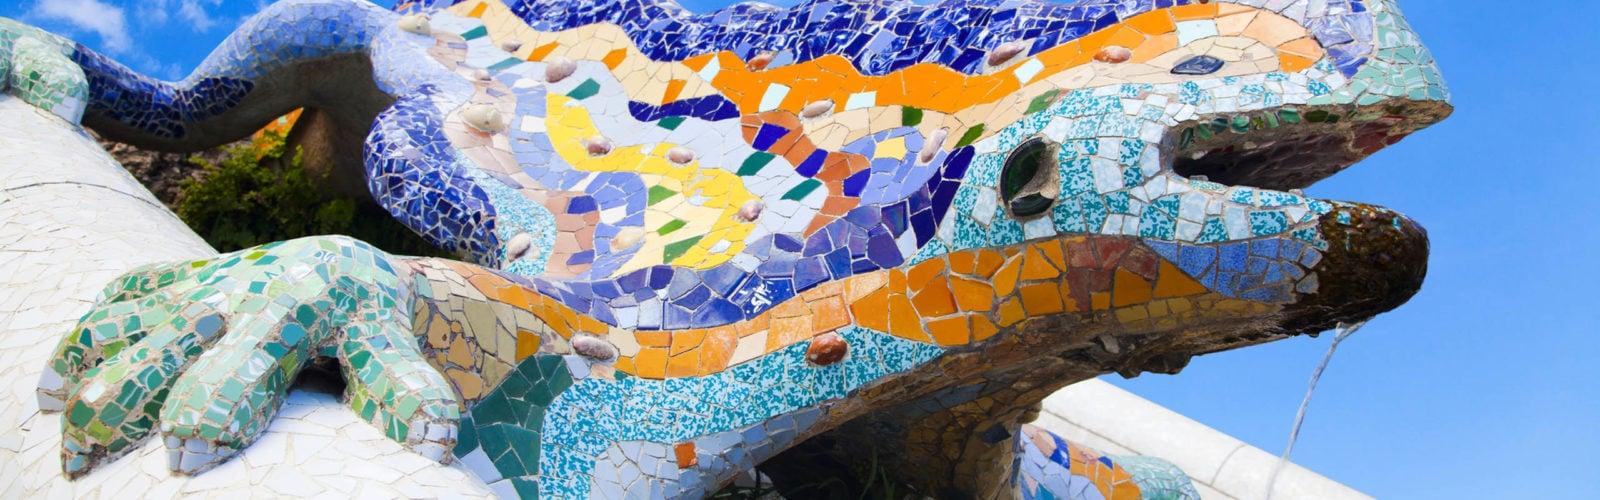 Parc Guell Lizard Fountain Gaudi Barcelona, Spain